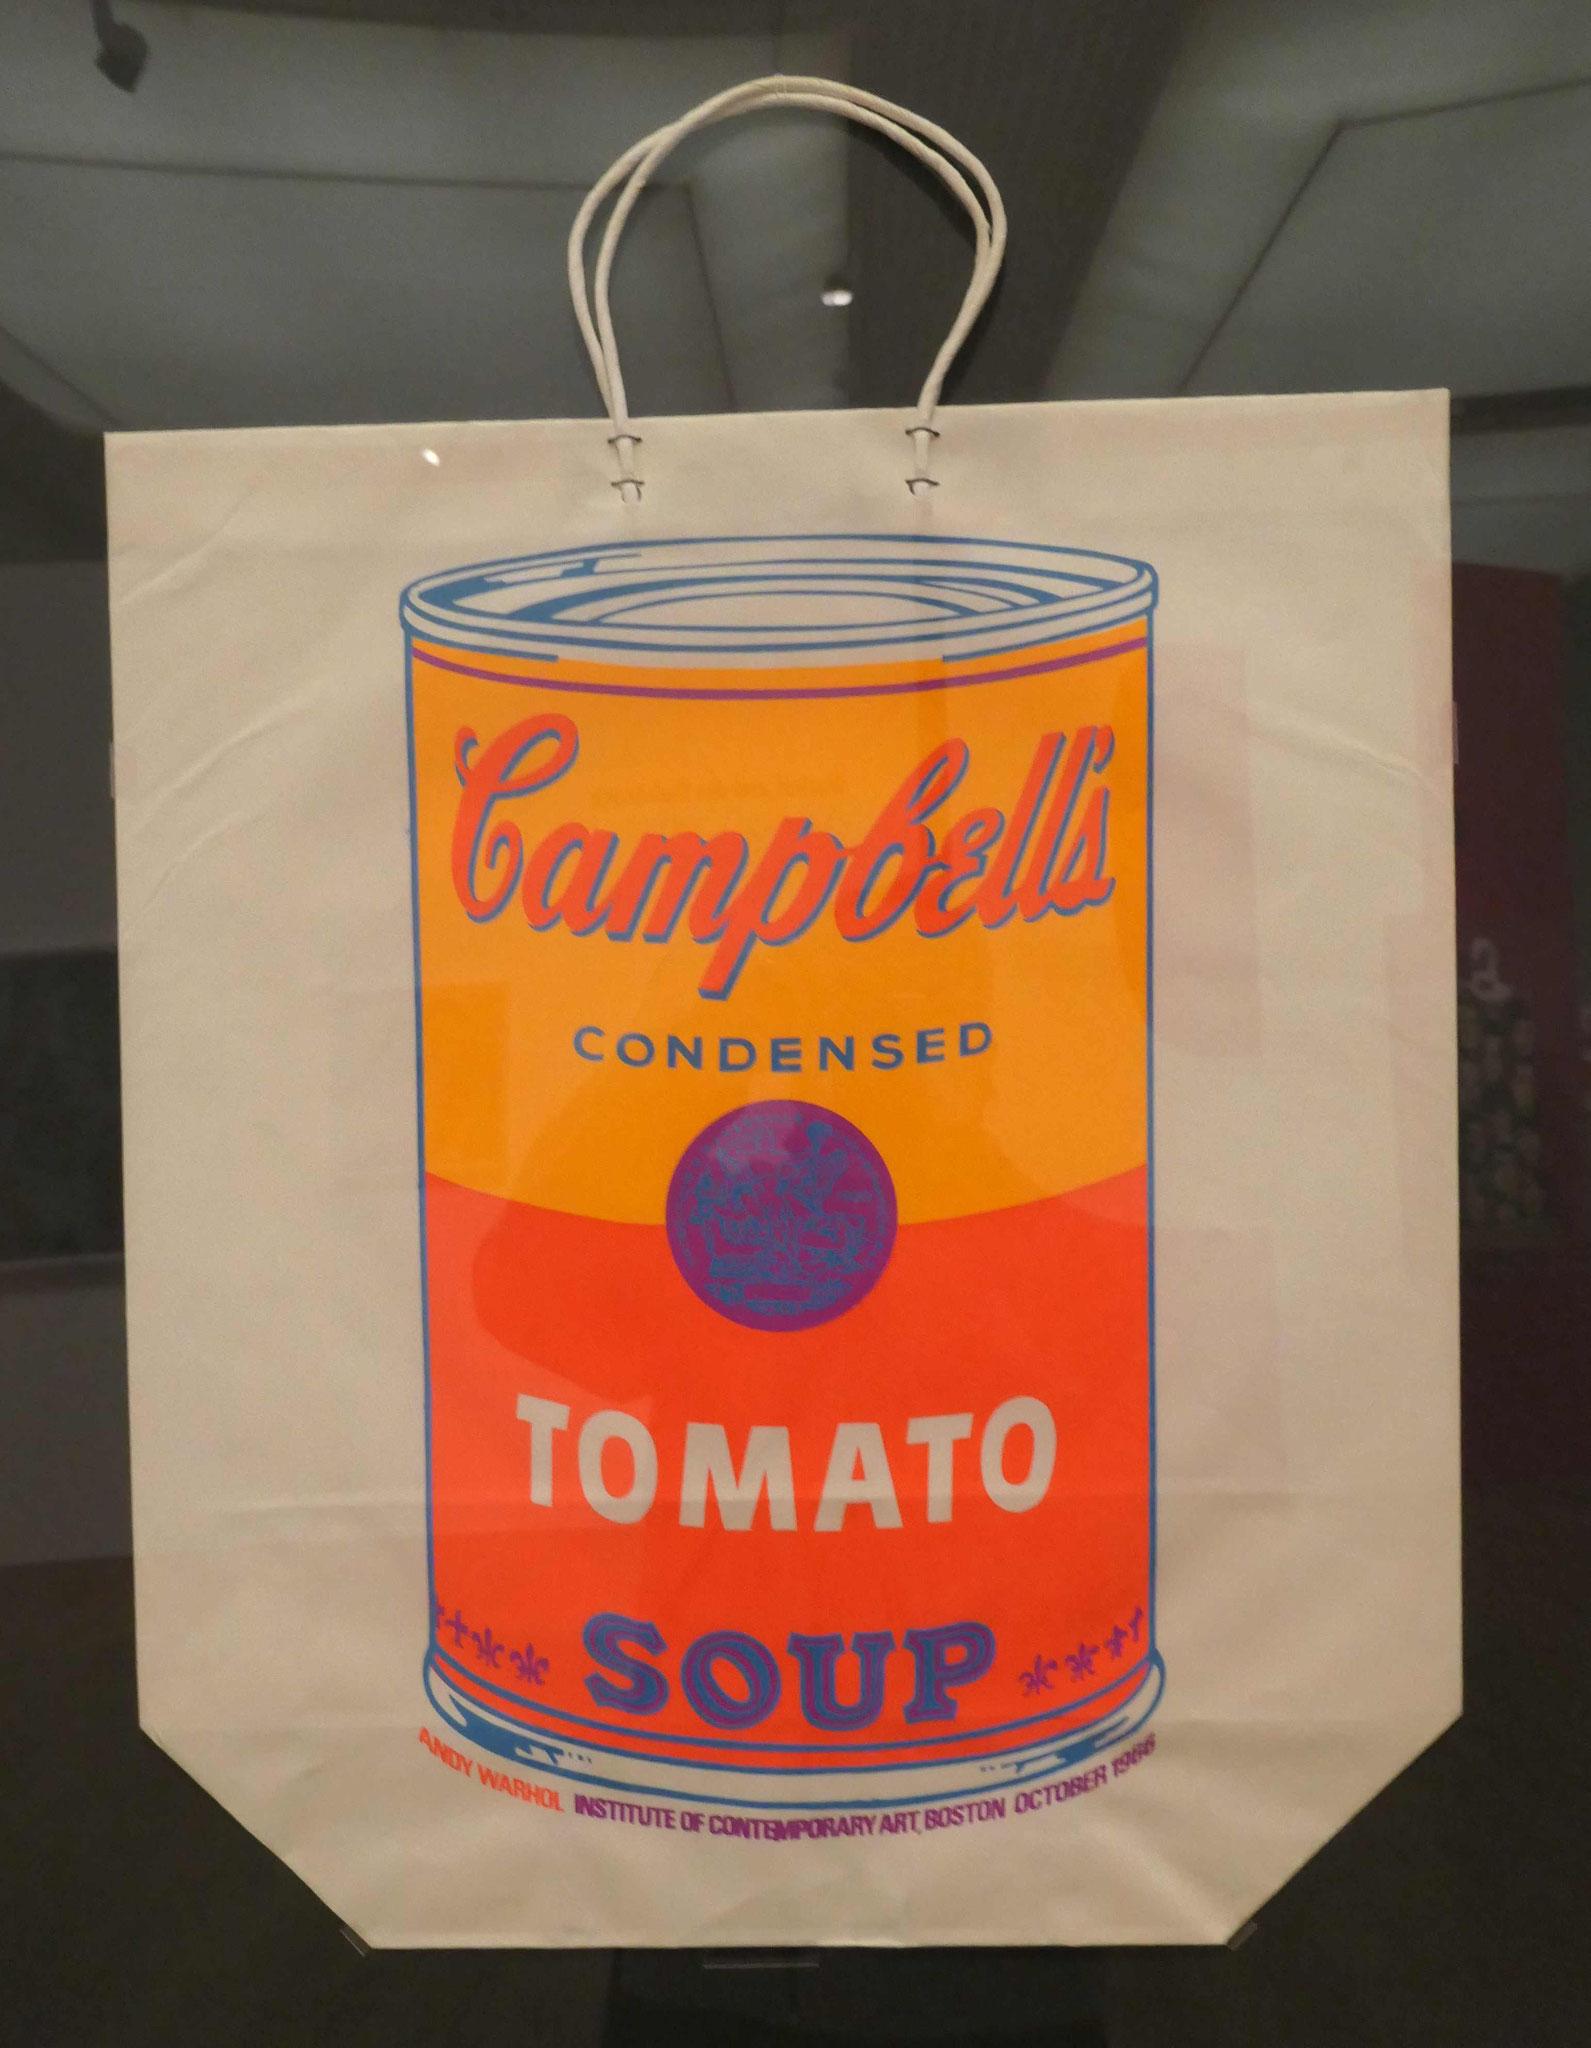 Andy Warhol, Campbell's soup can, 1966, Siebdruck, Kunstbibliothek Berlin